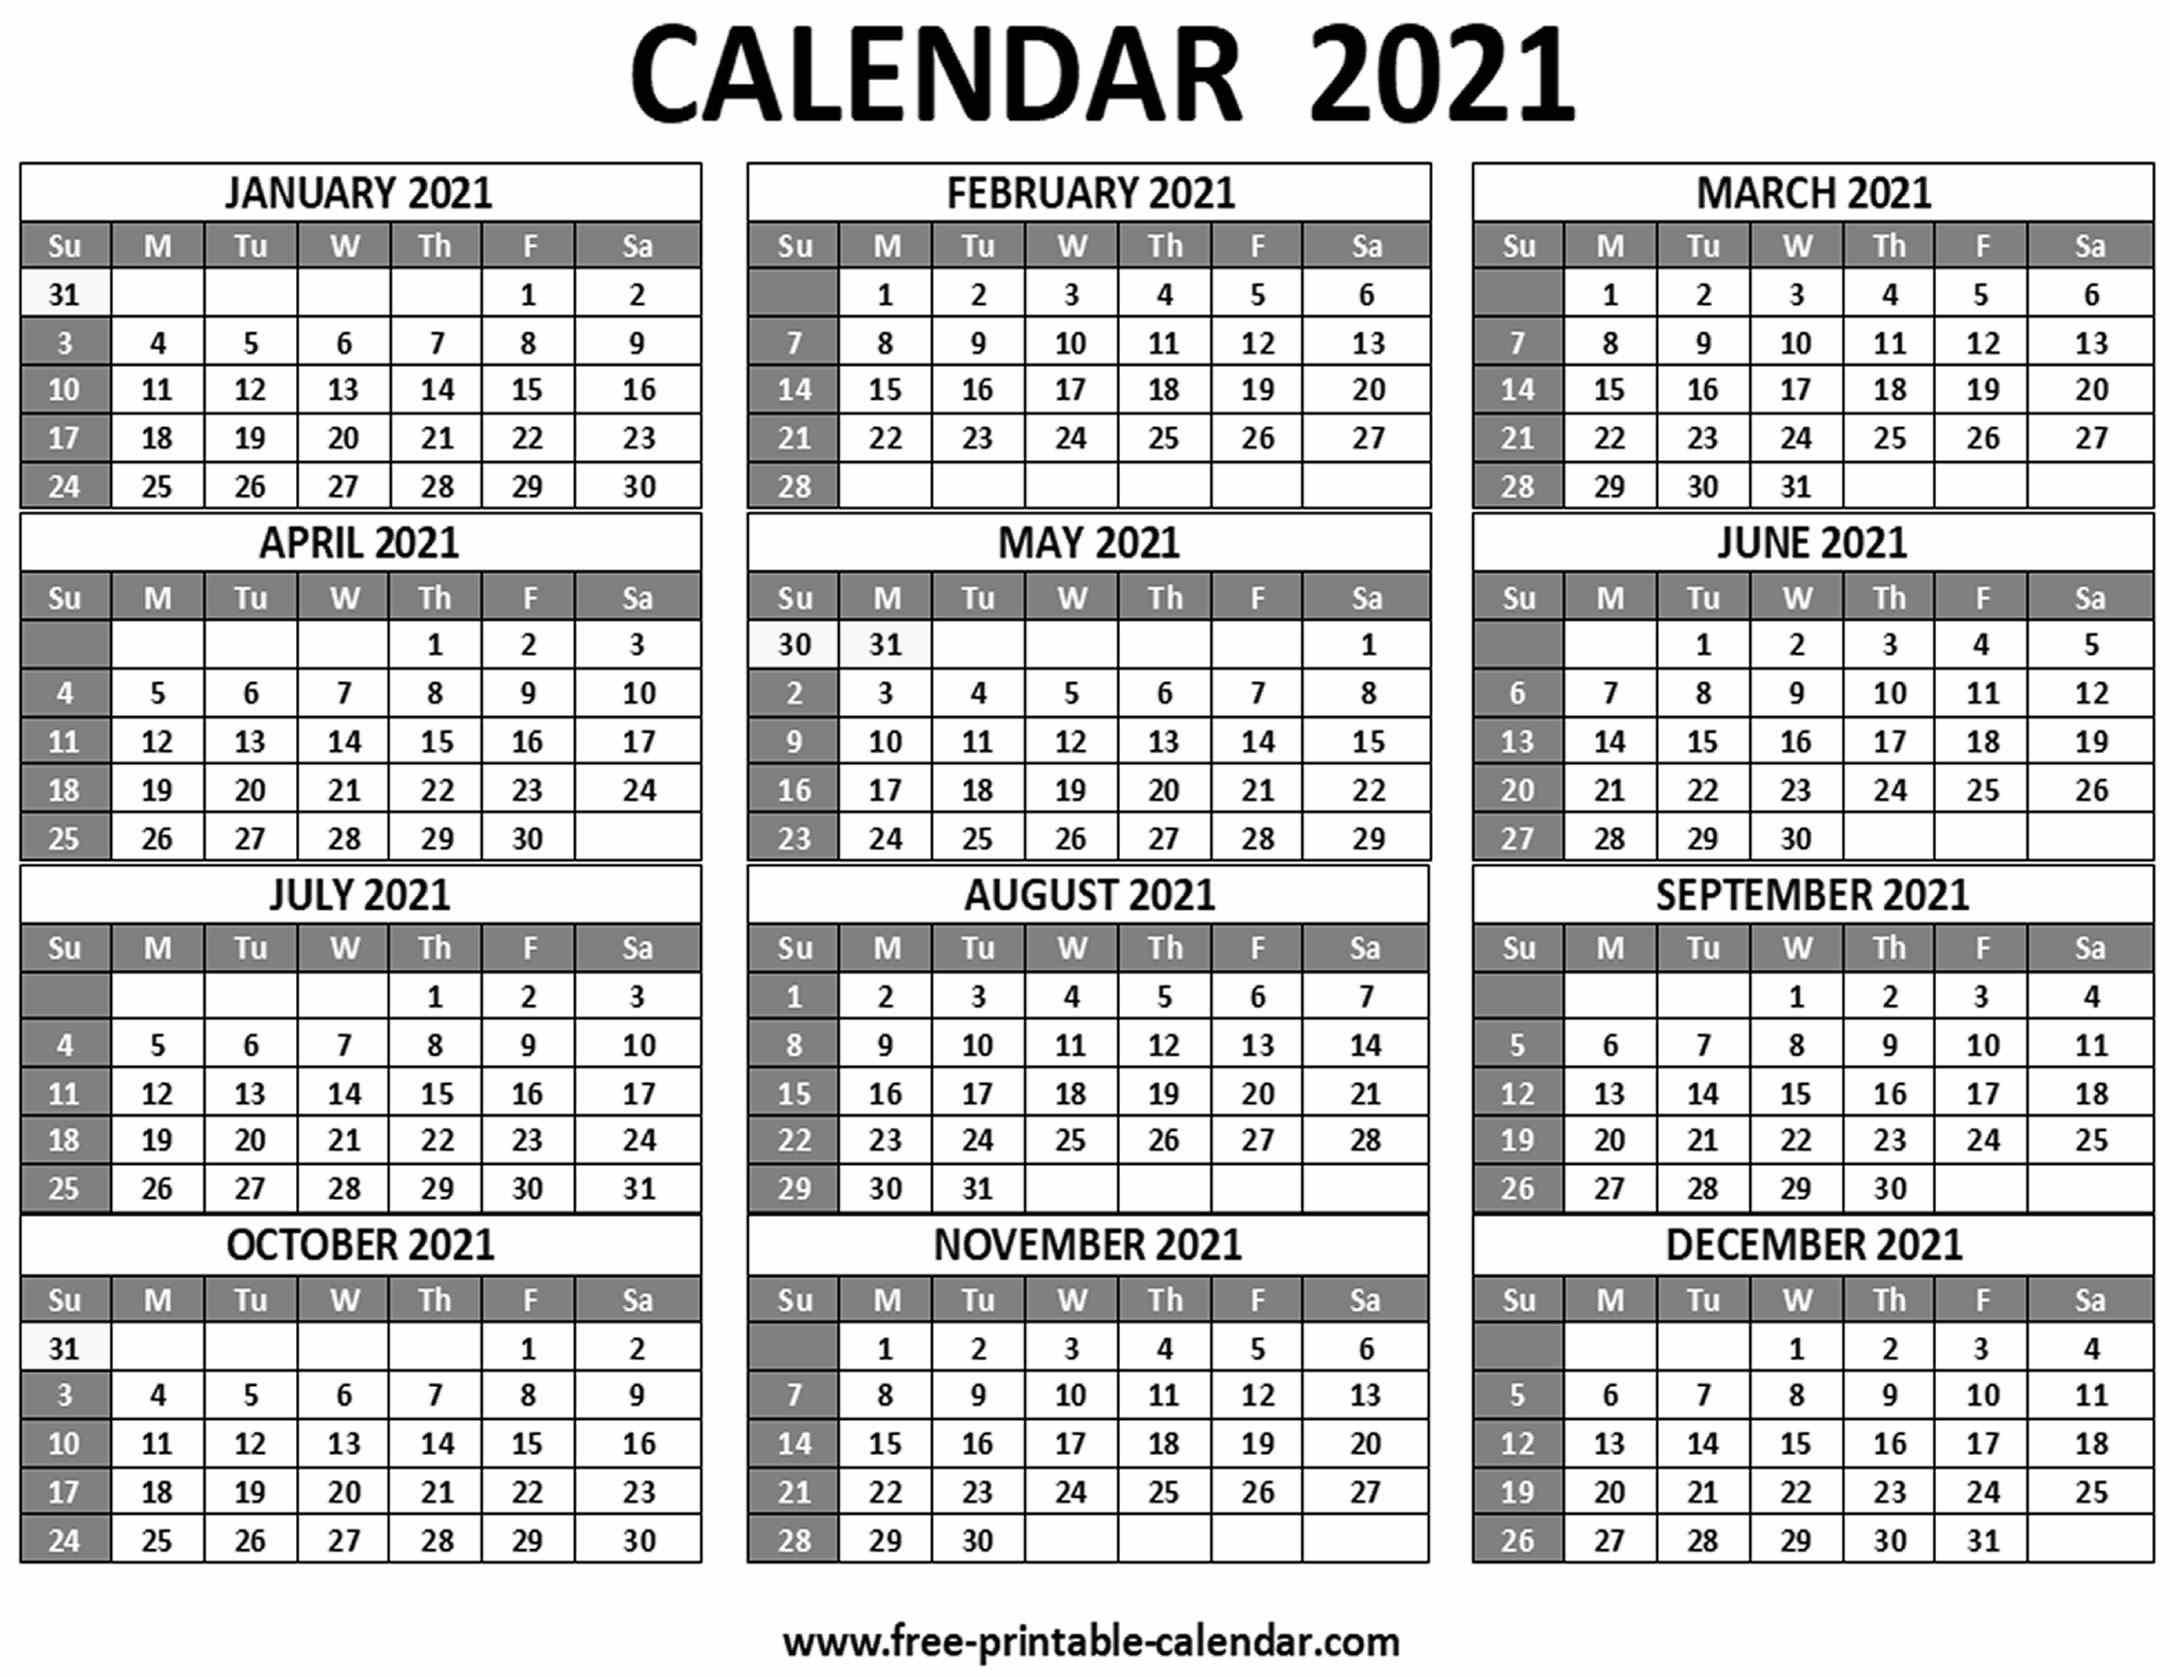 Printable 2021 Calendar  Freeprintablecalendar in Free 3 Month Calendar One Page 2021